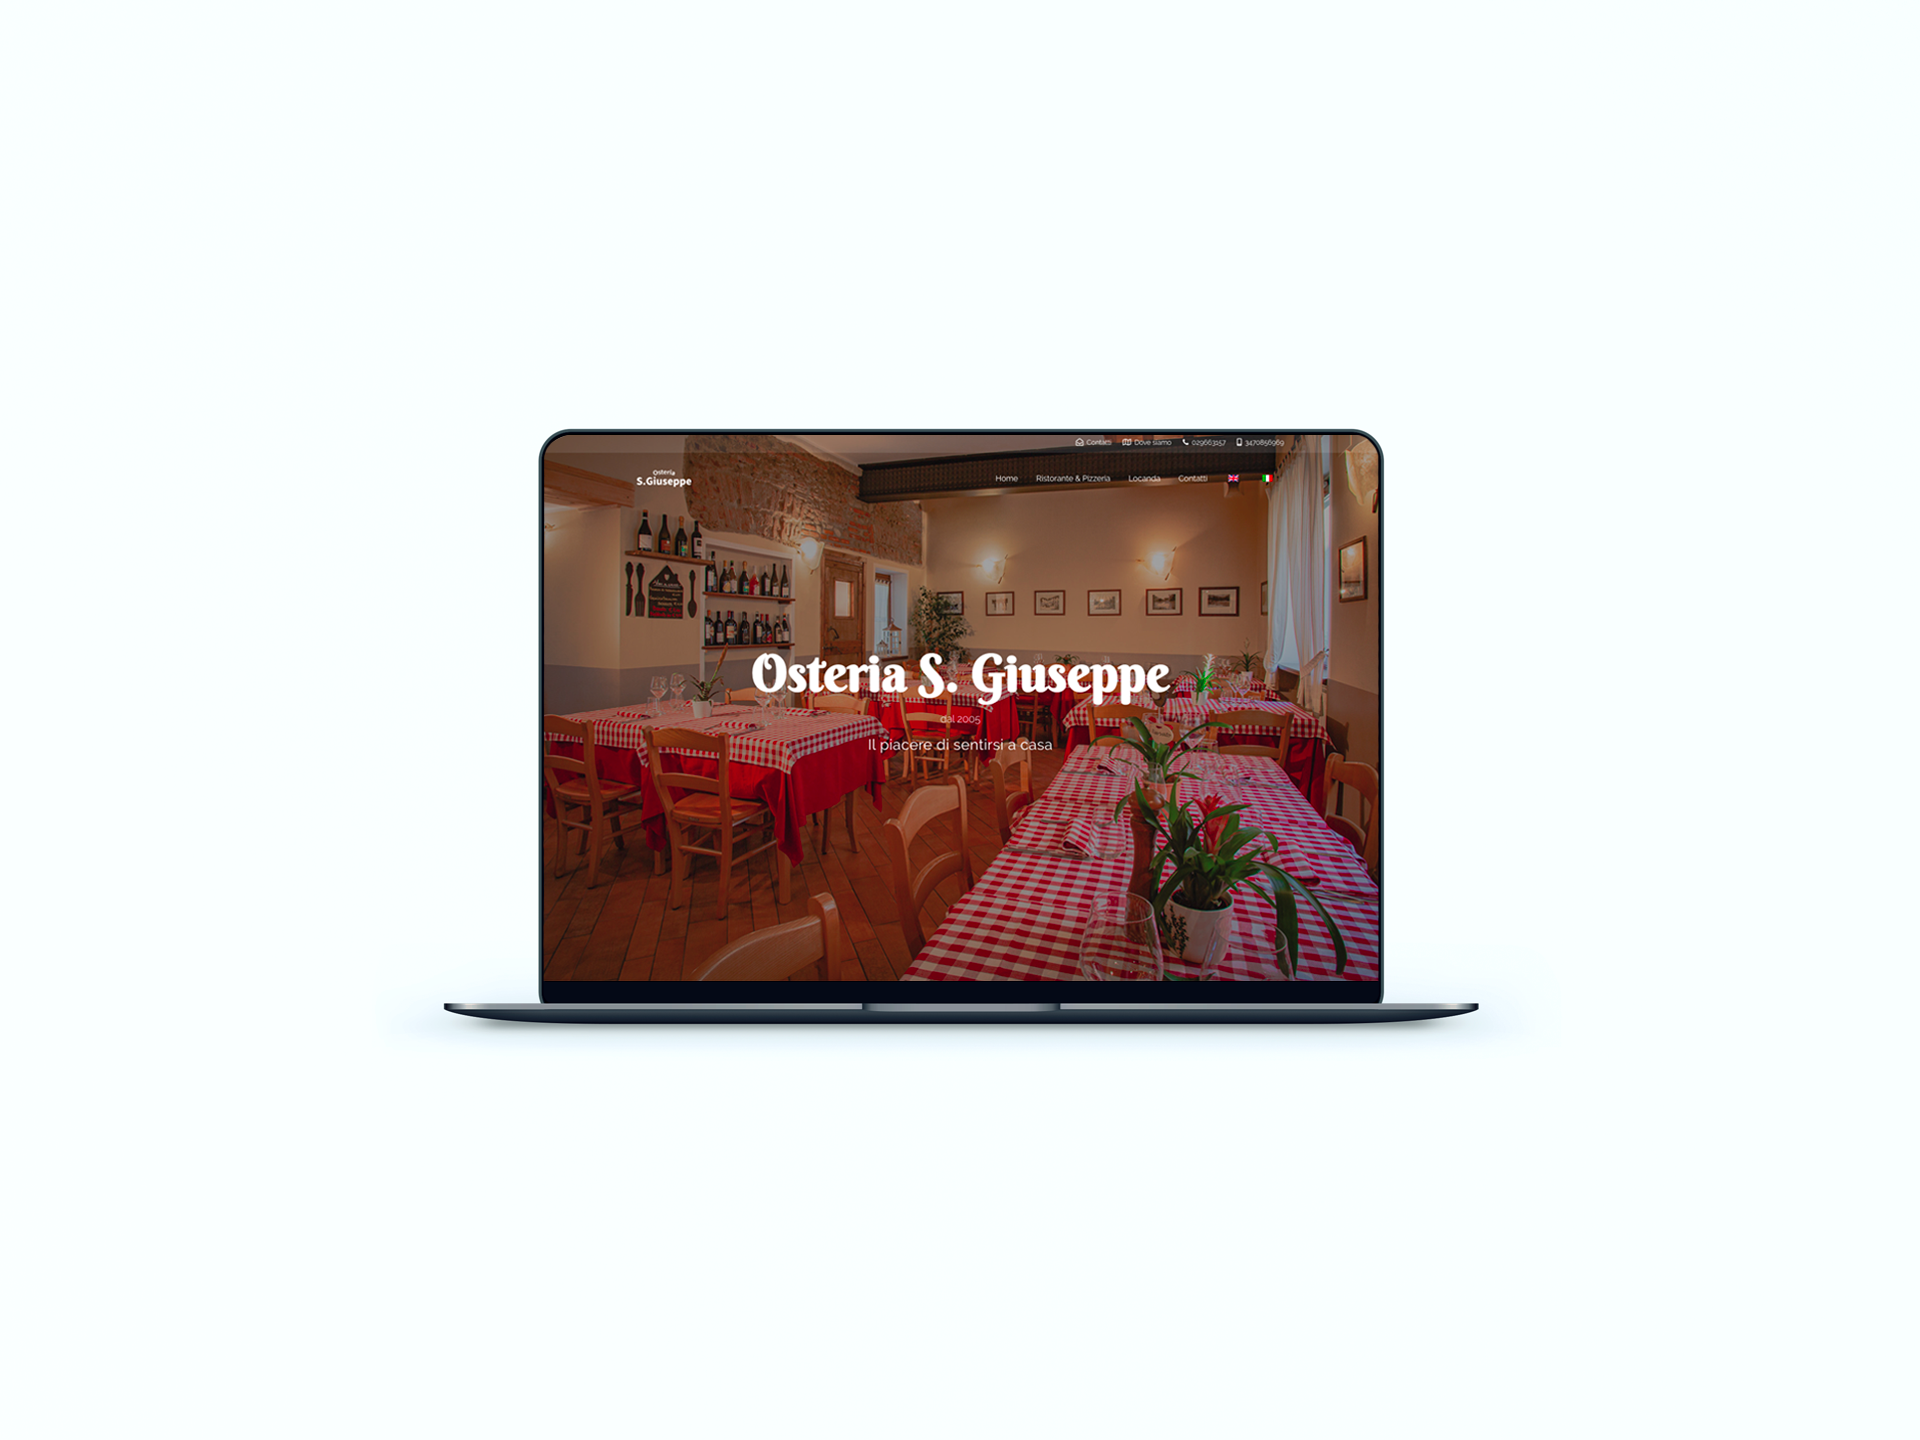 Osteria-s-giuseppe